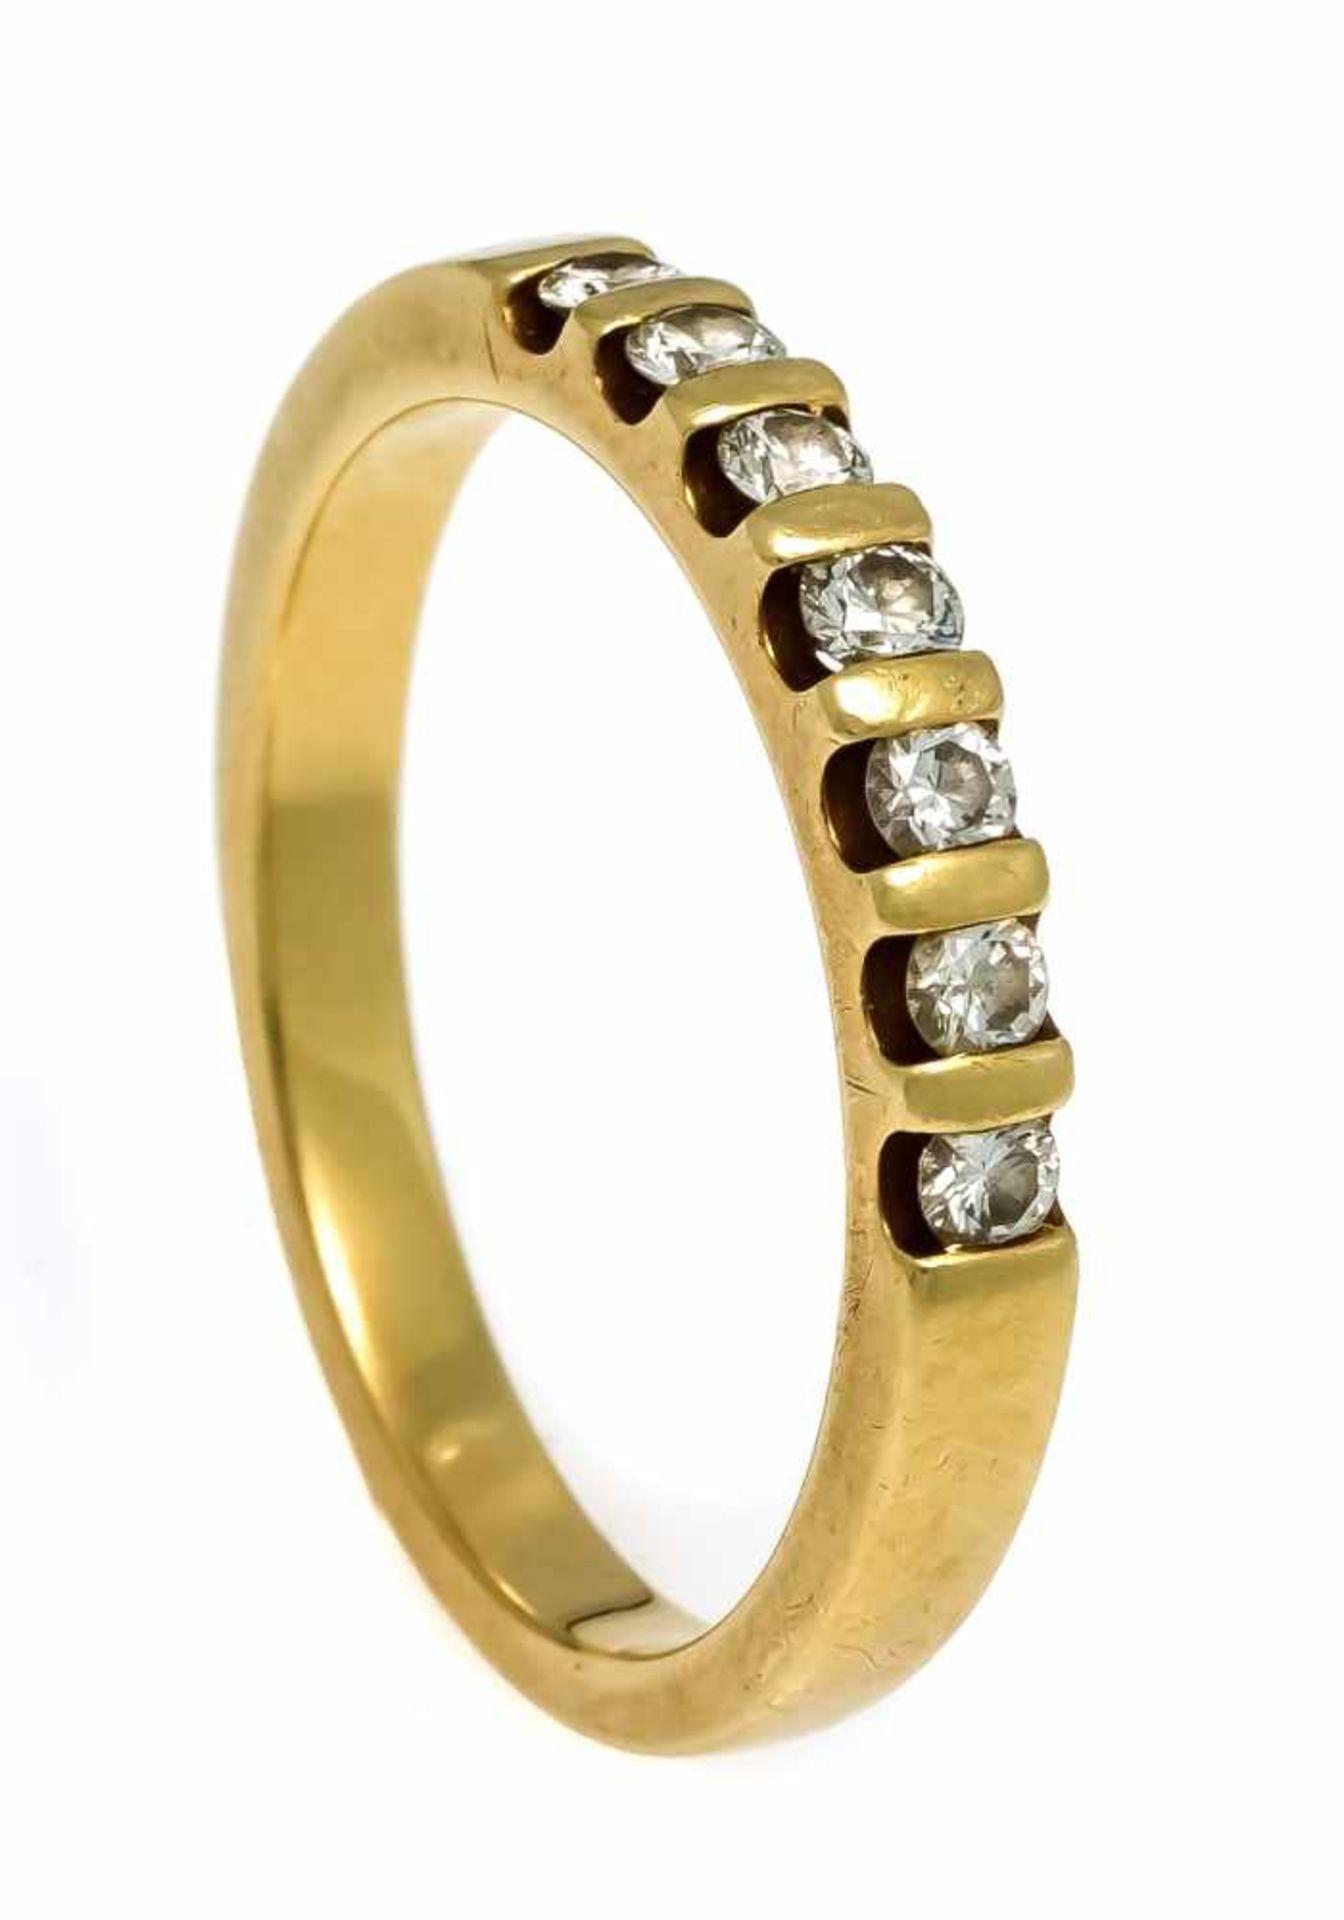 Memory-Ring GG 750/000 mit 7 Brillanten, zus. 0,40 ct l.get.W/VS-SI, RG 59, 5,3 gMemory ring GG